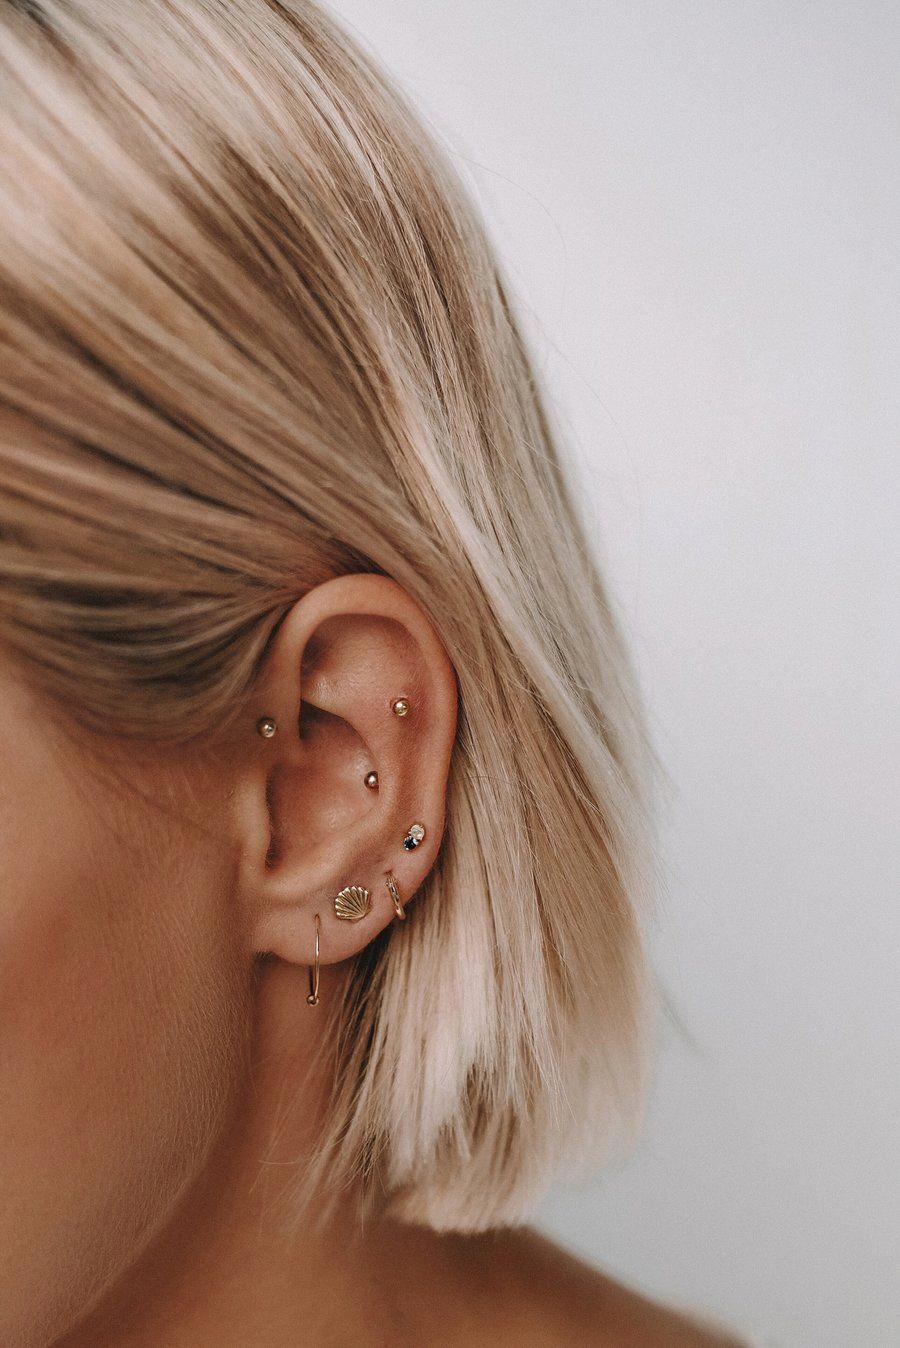 Pin On Ear Rings